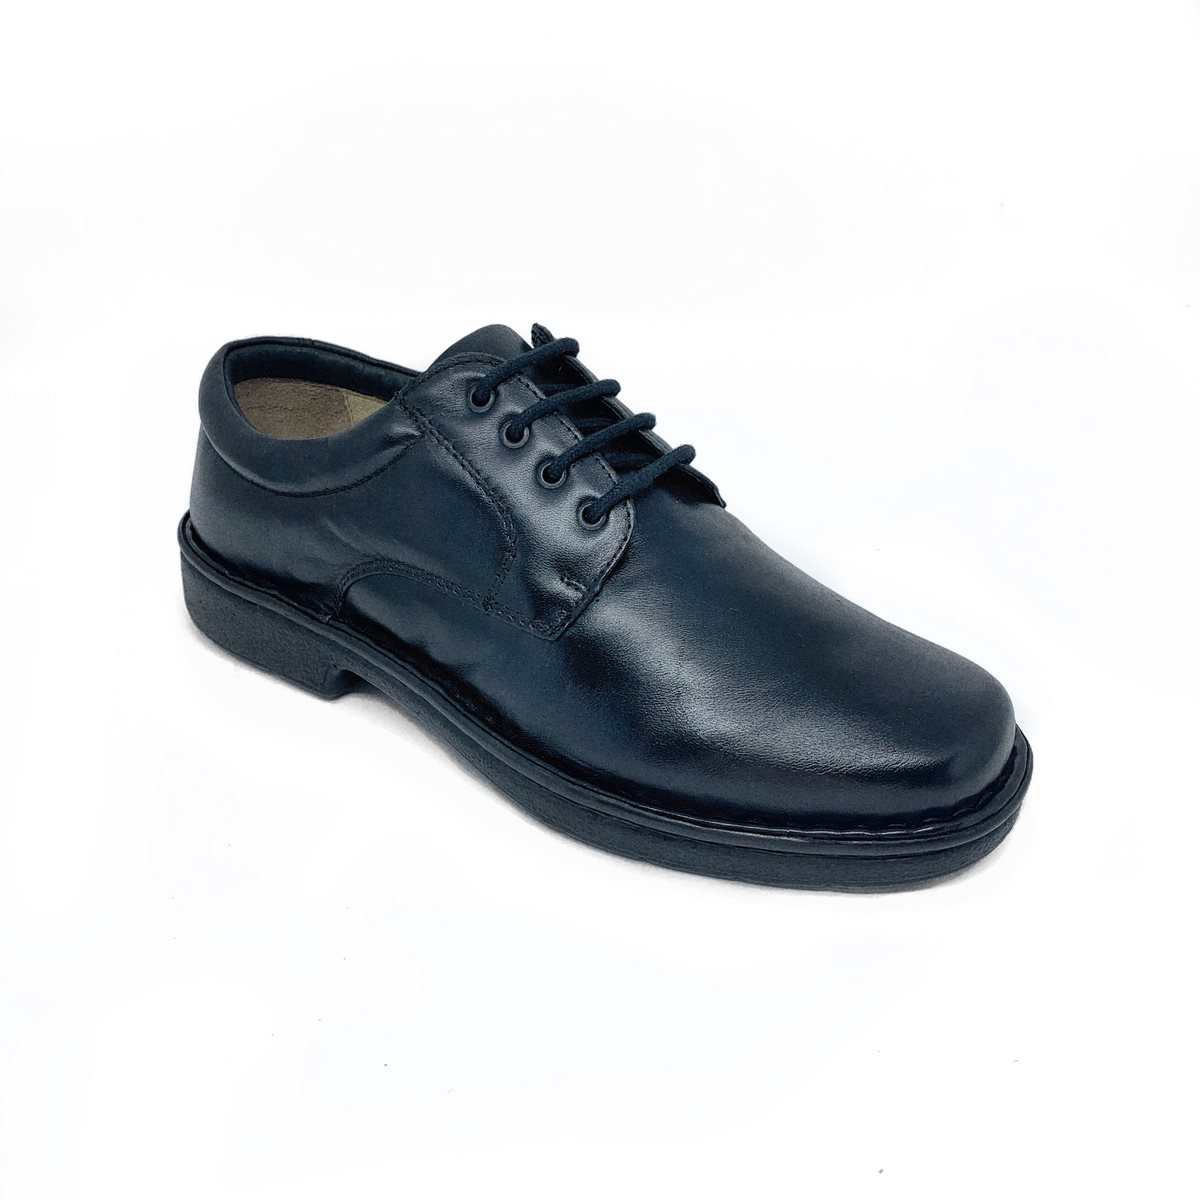 Sapato Social Cadarço Pipper  - Preto